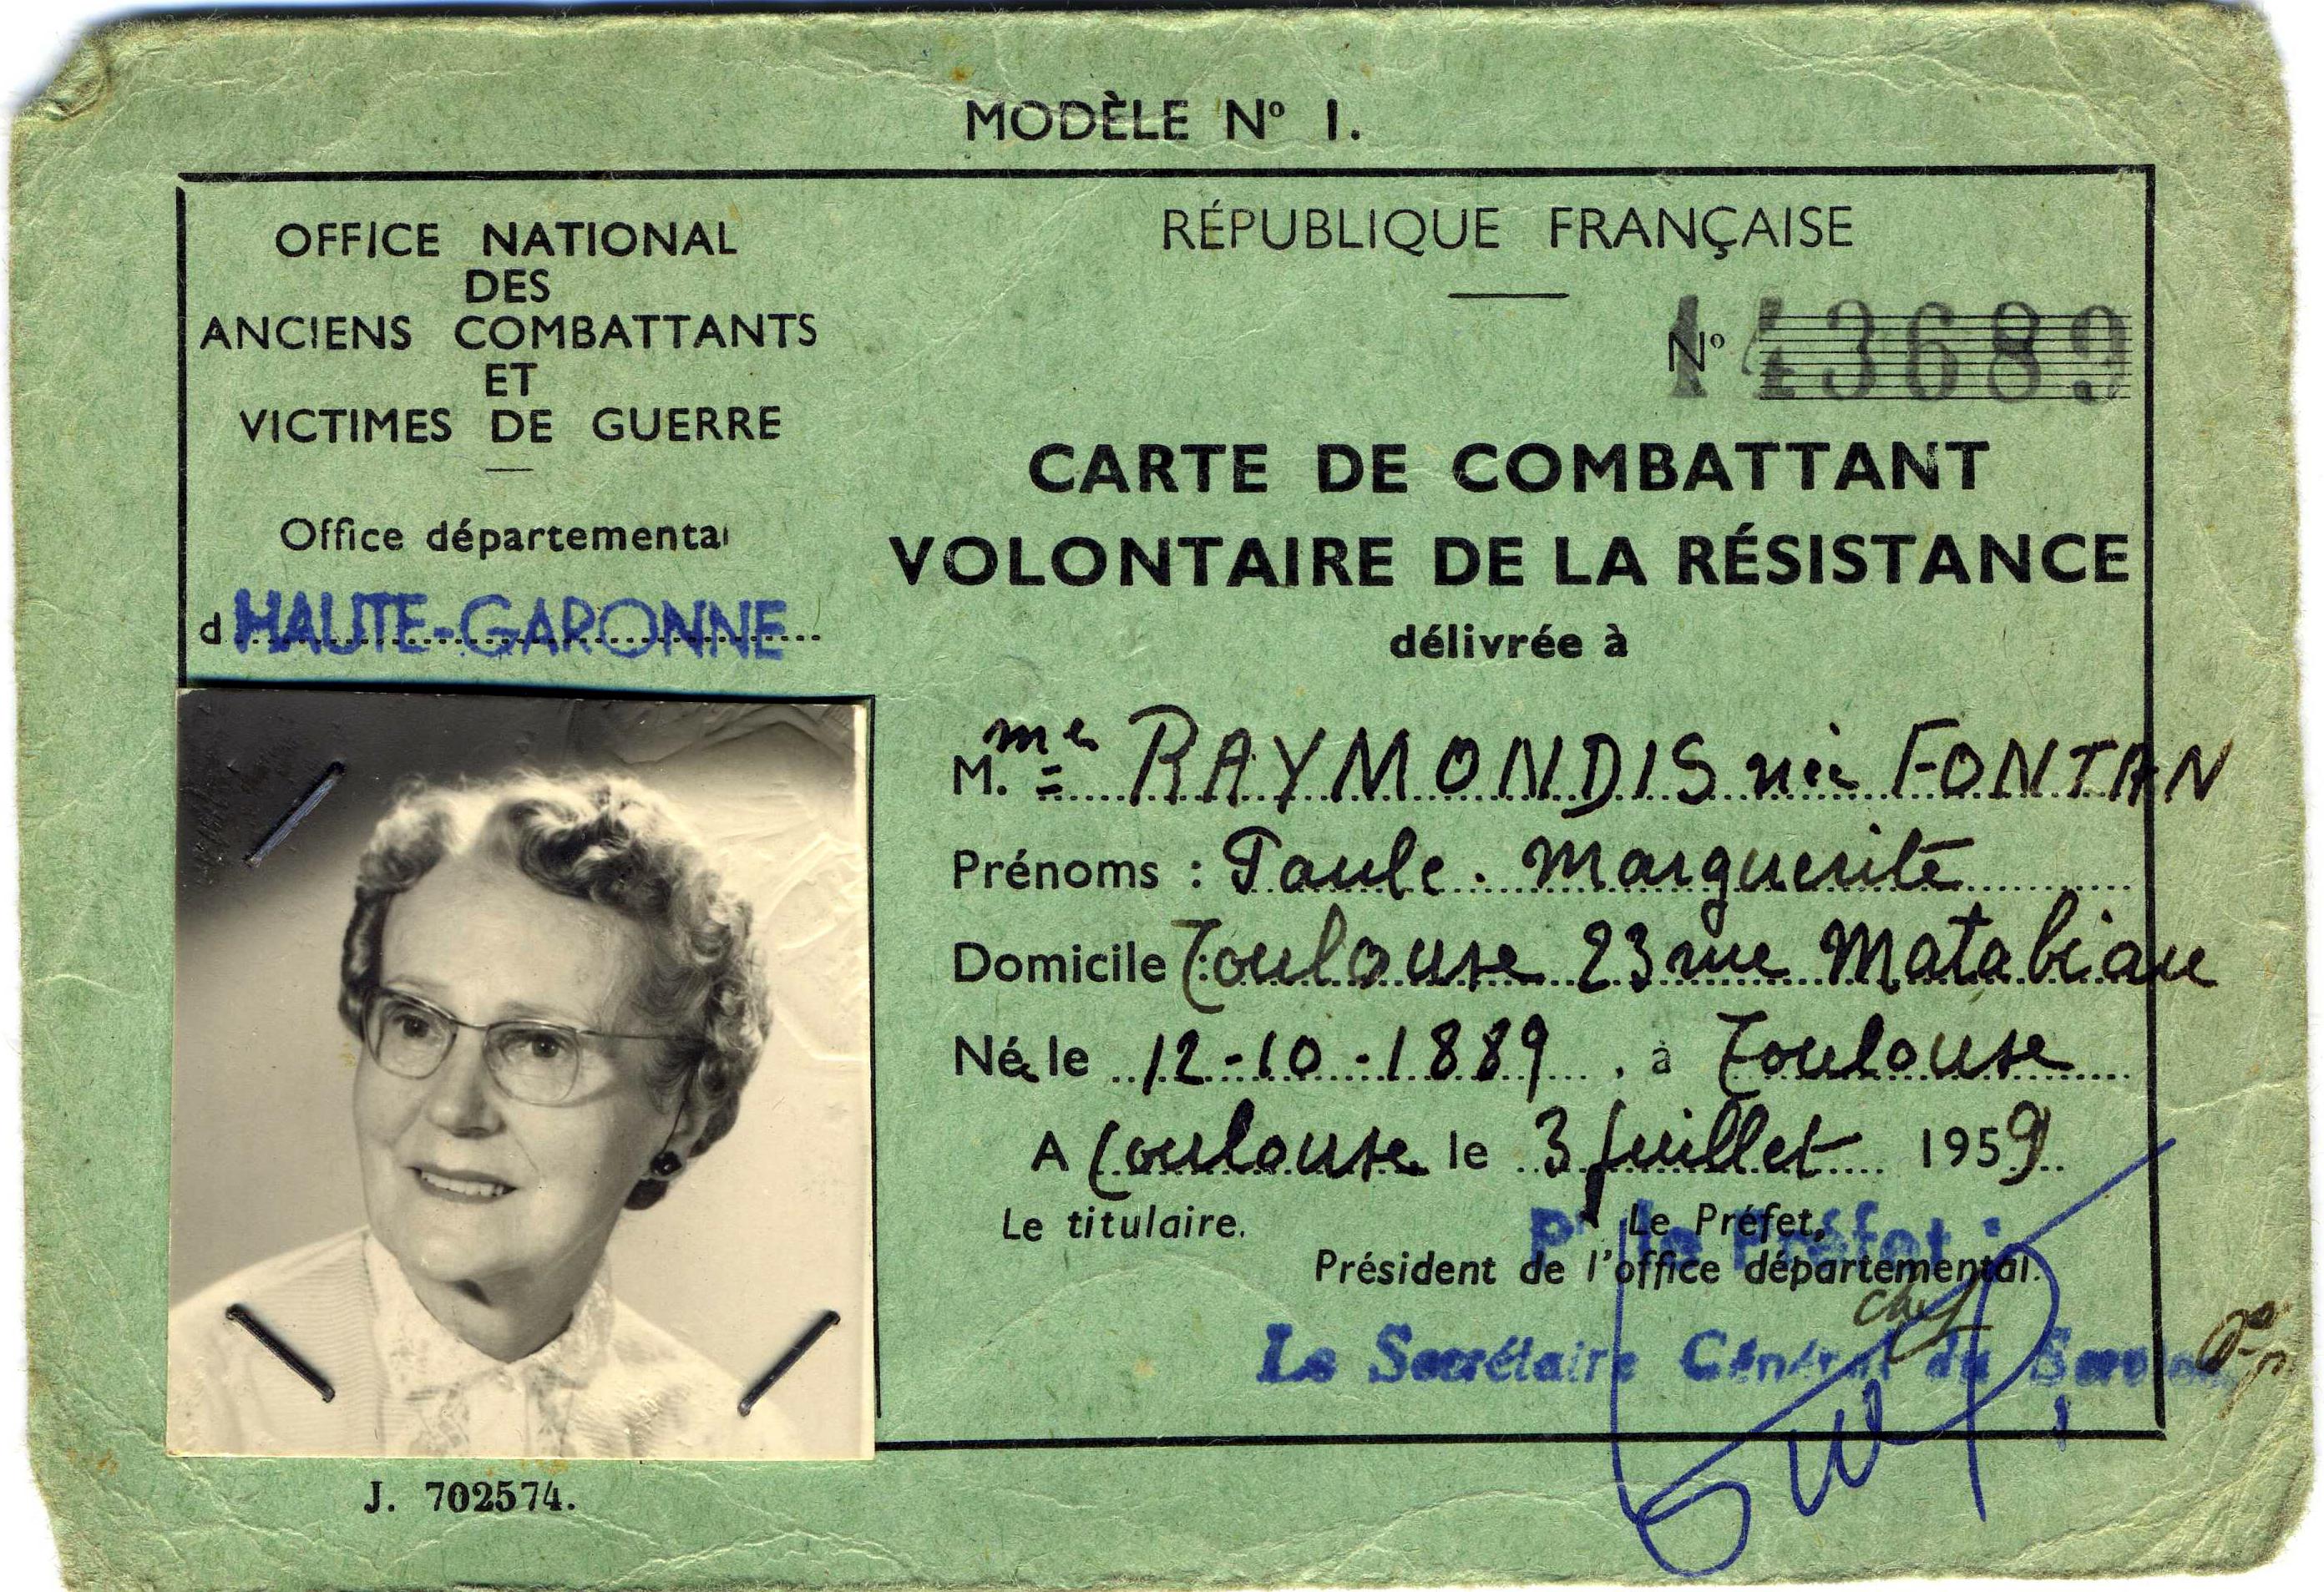 Raymondis Paule carte combattant volontaire resistance